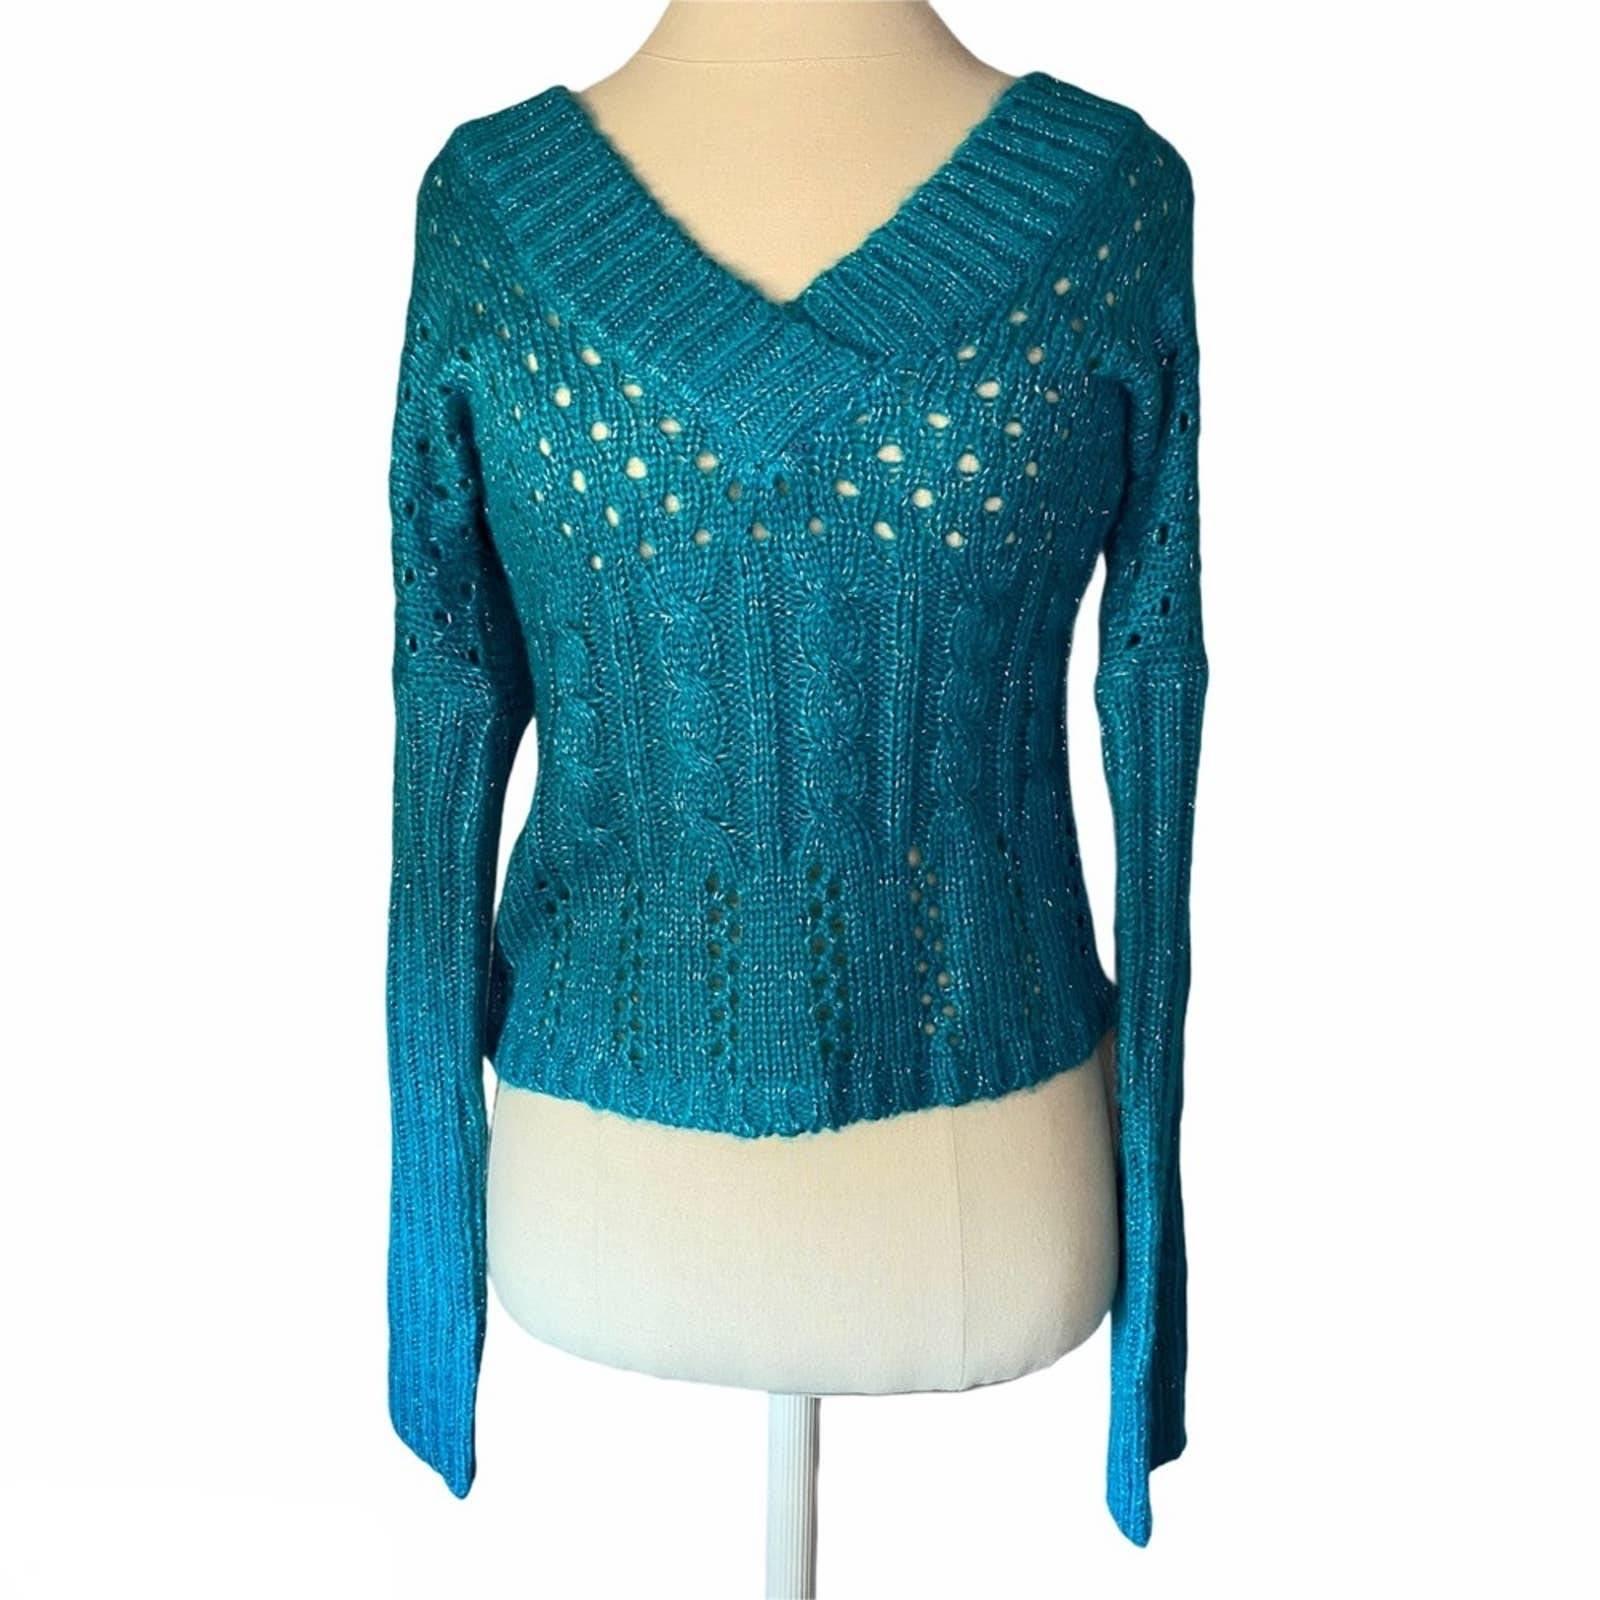 Wet Seal Metallic V-Neck Knit Sweater